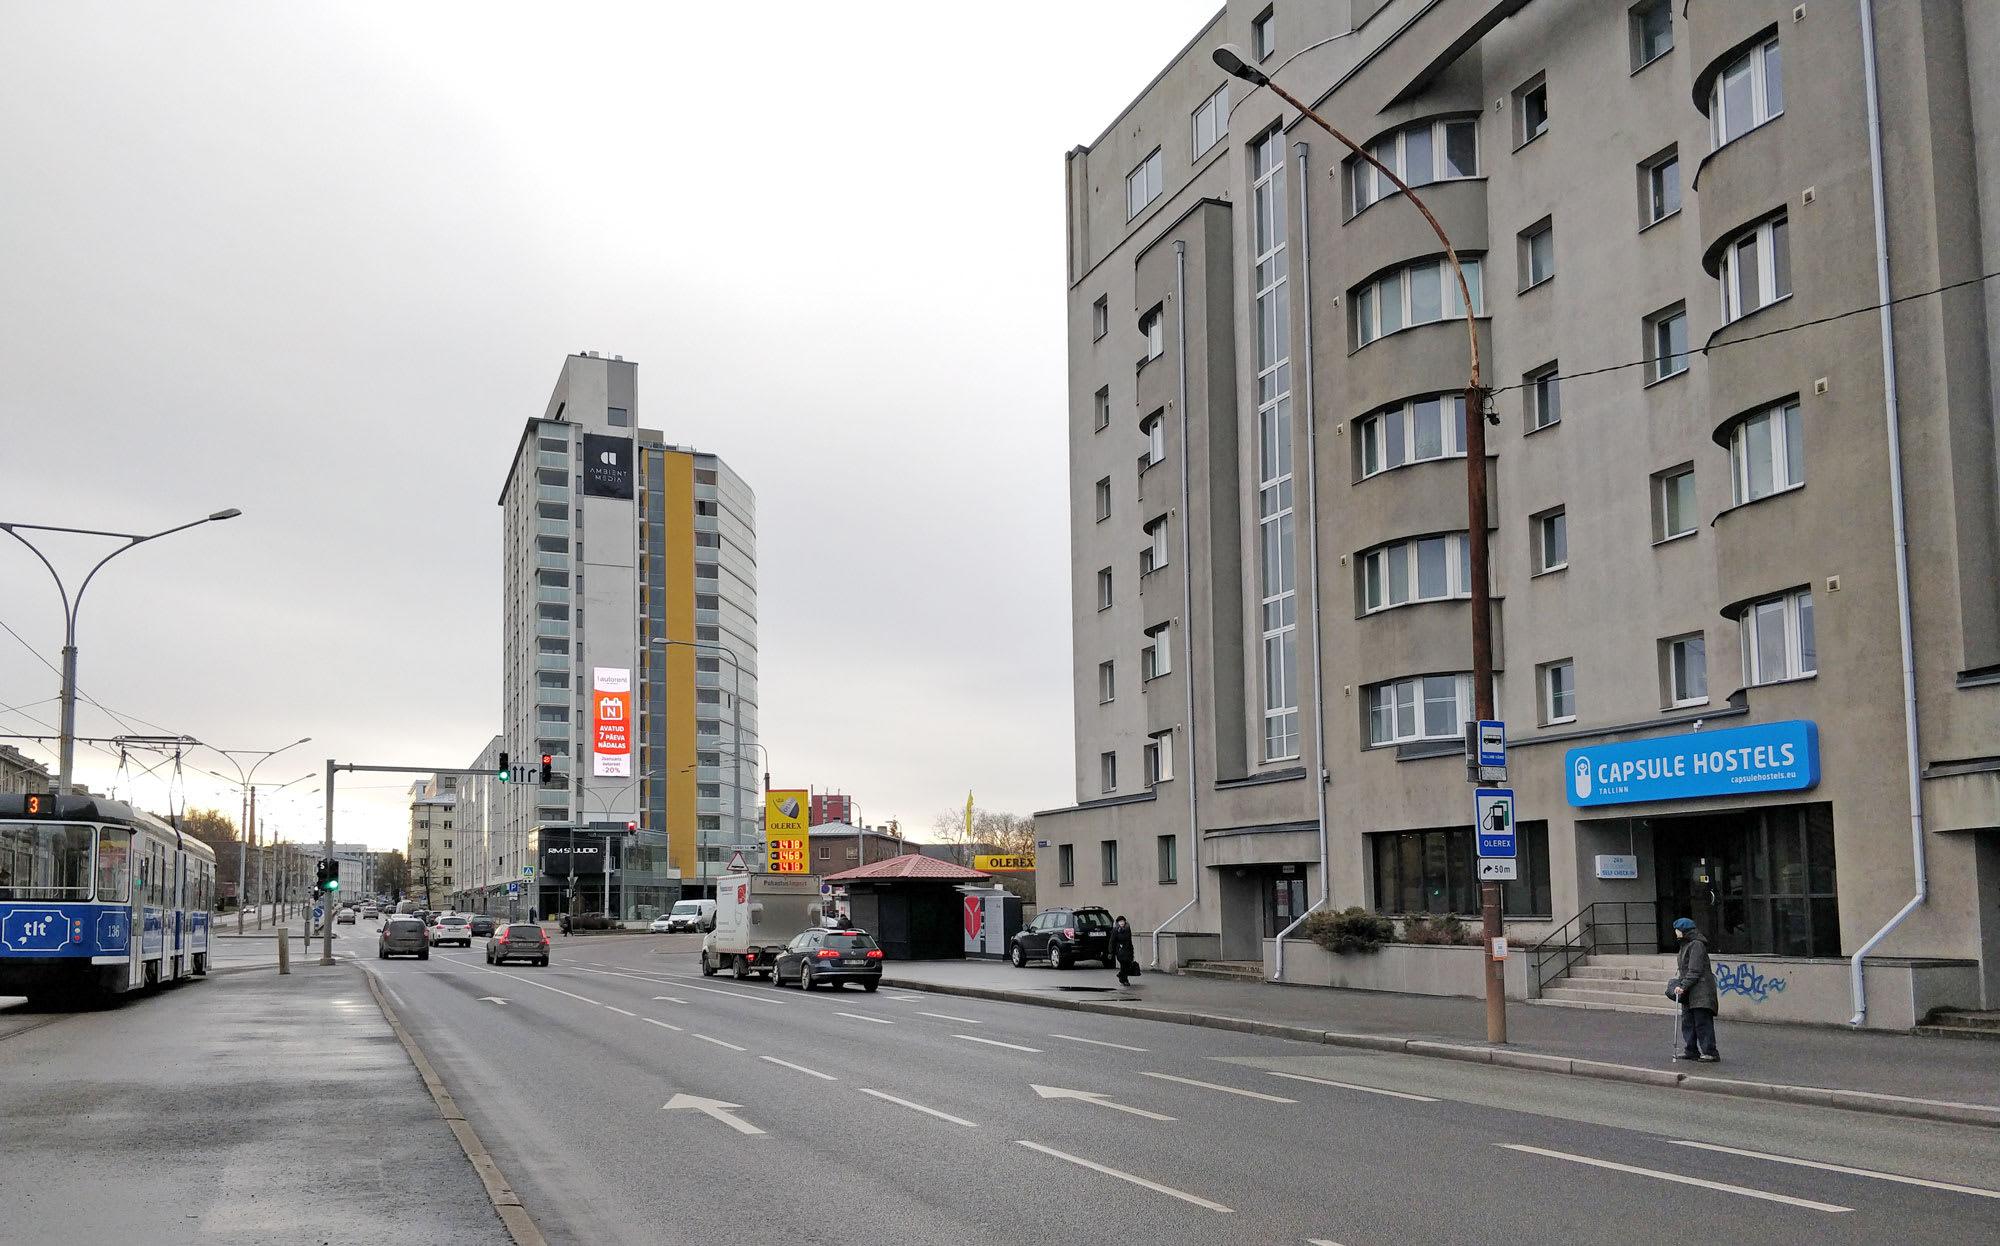 HOSTEL - Capsule Hostels Tallinn